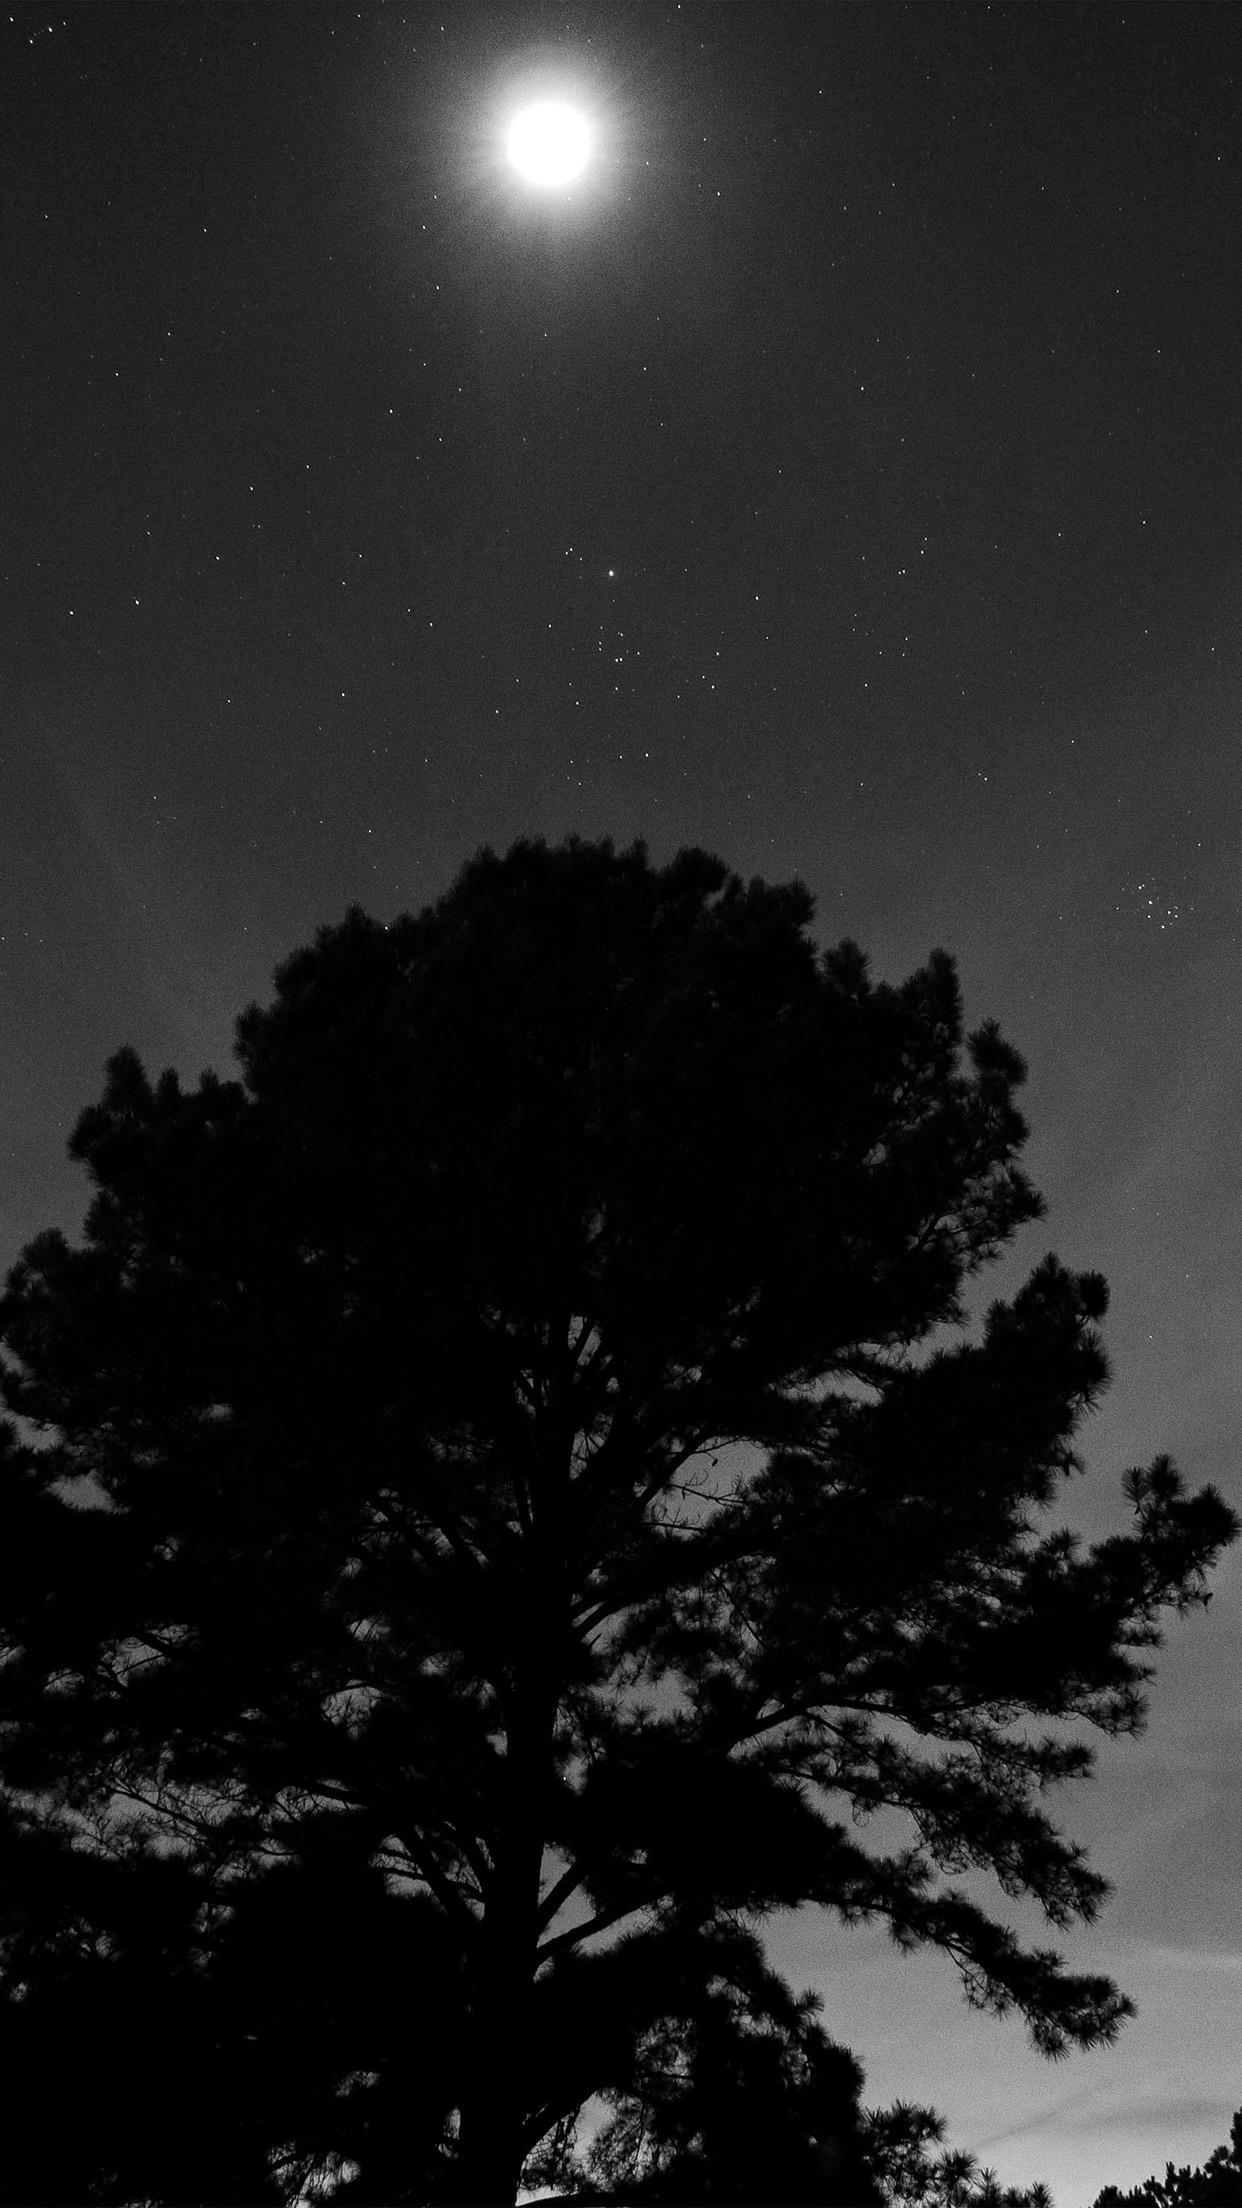 Nj69 One Star Shine Night Dark Sky Wood Bw